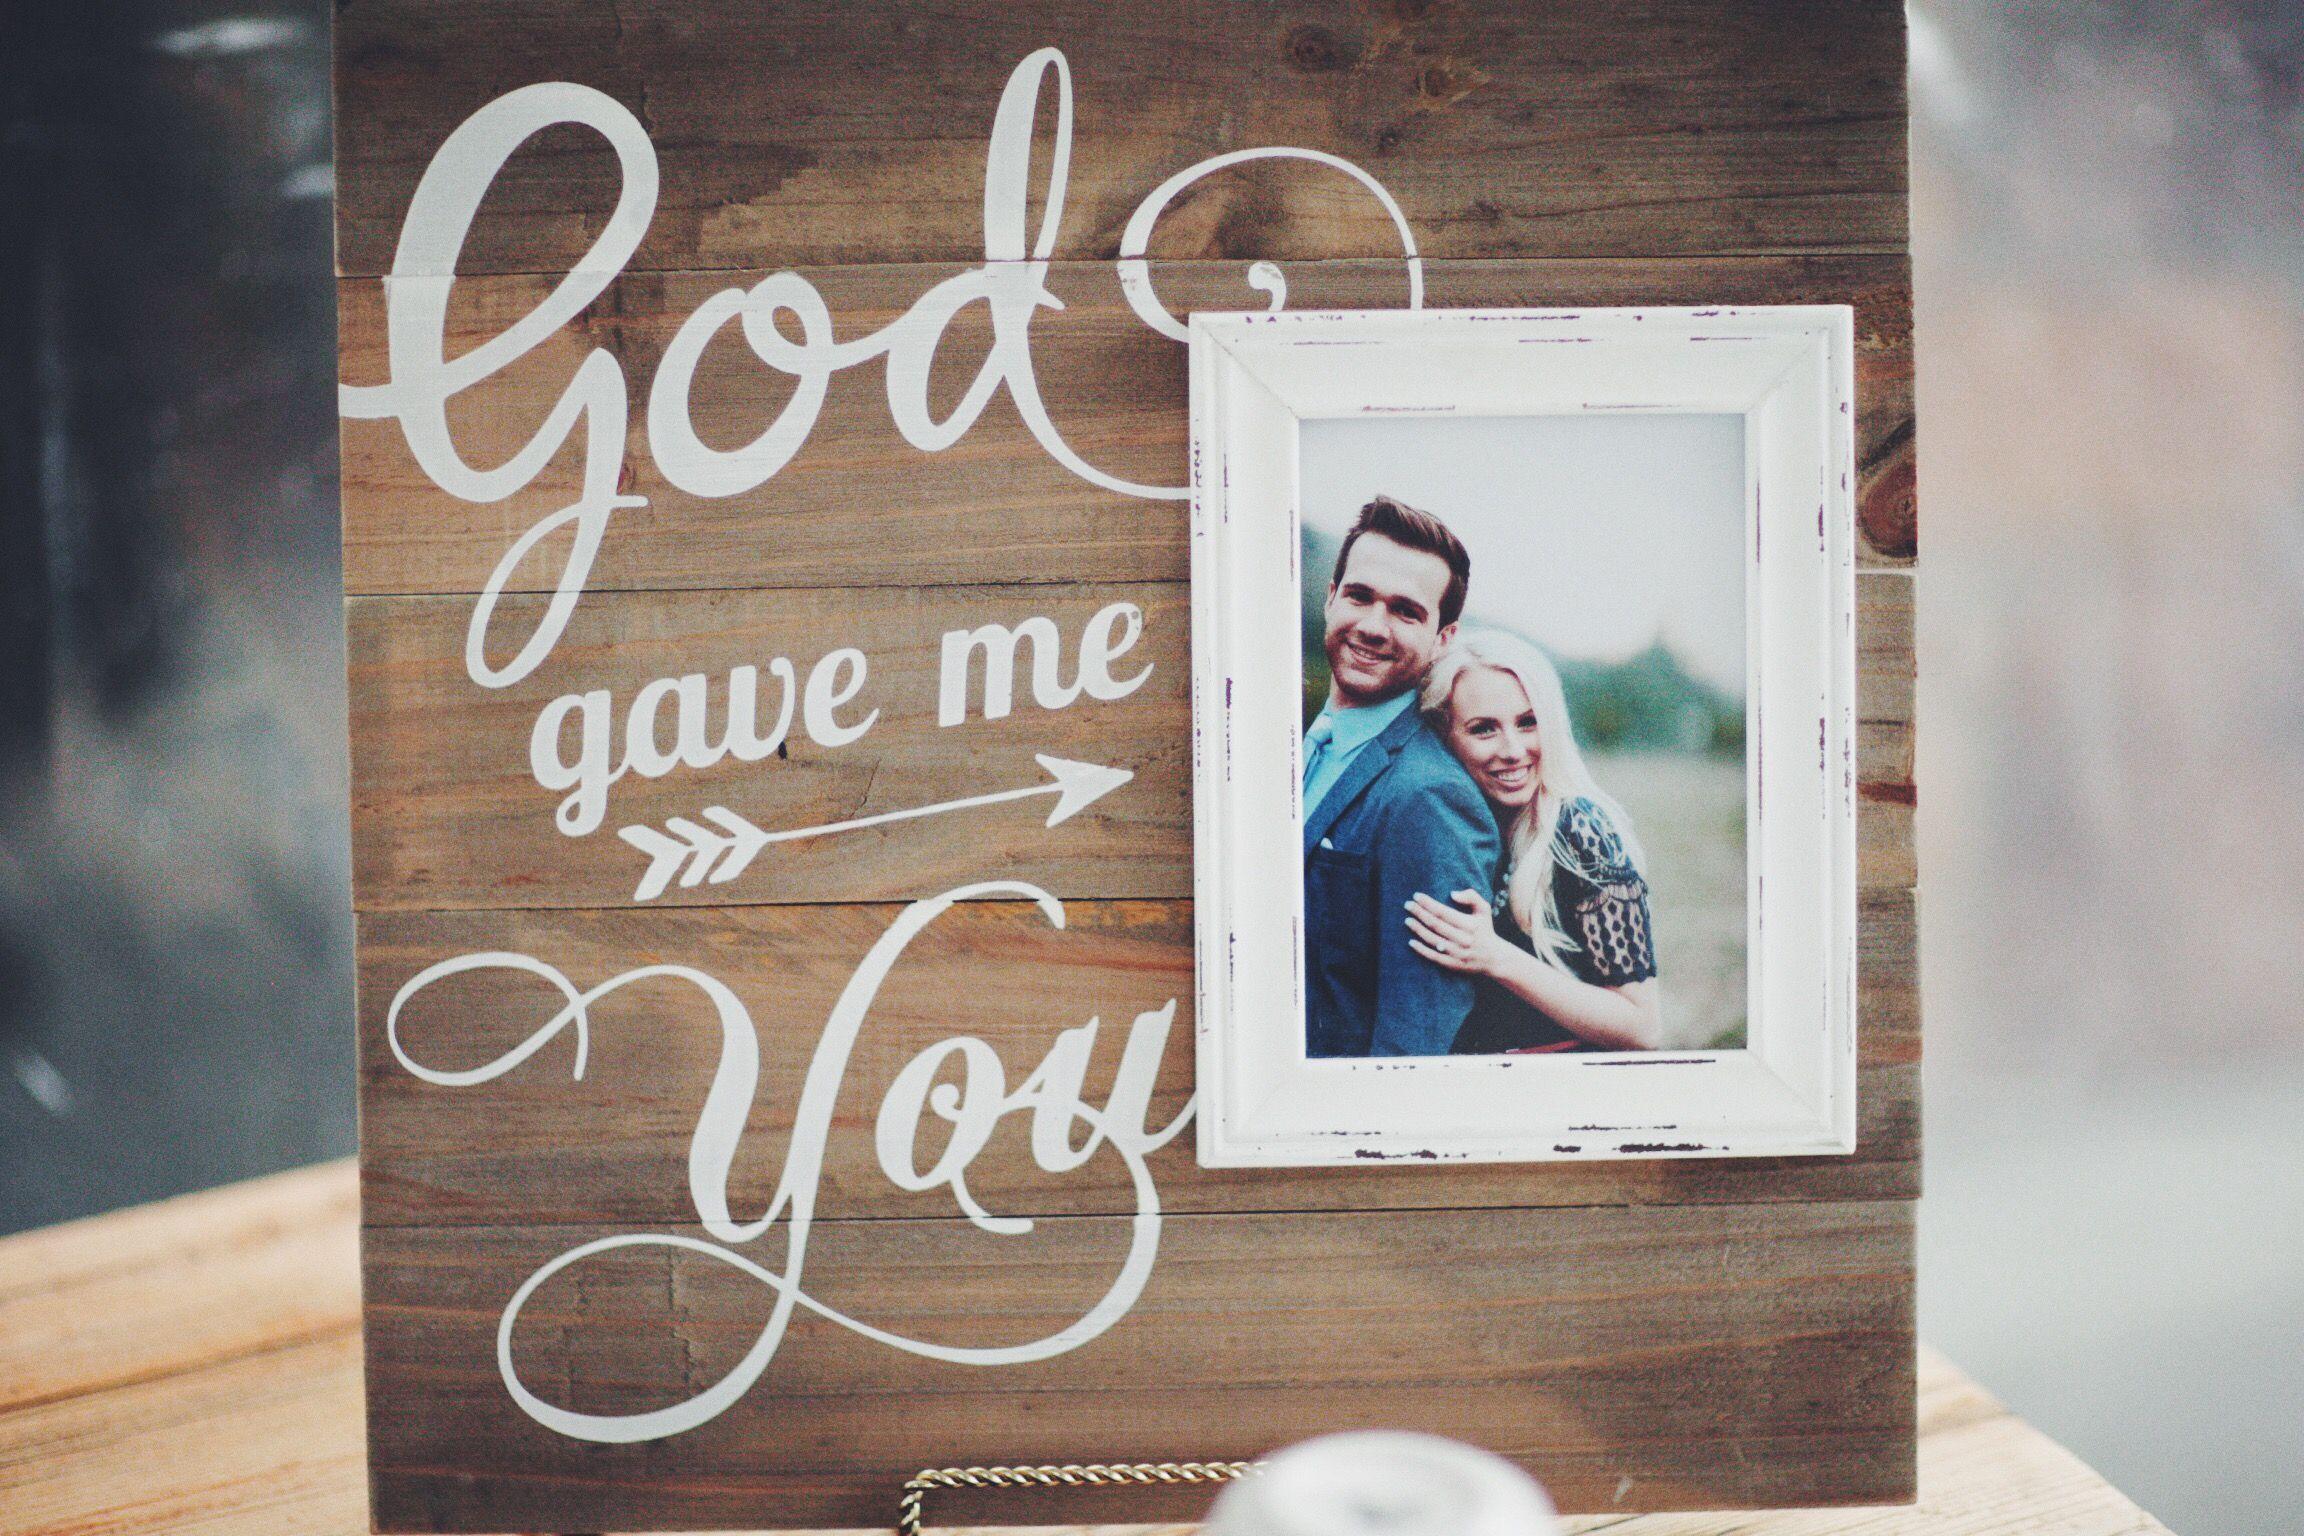 God gave me you Hobby Lobby Wedding Decor Picture Frame